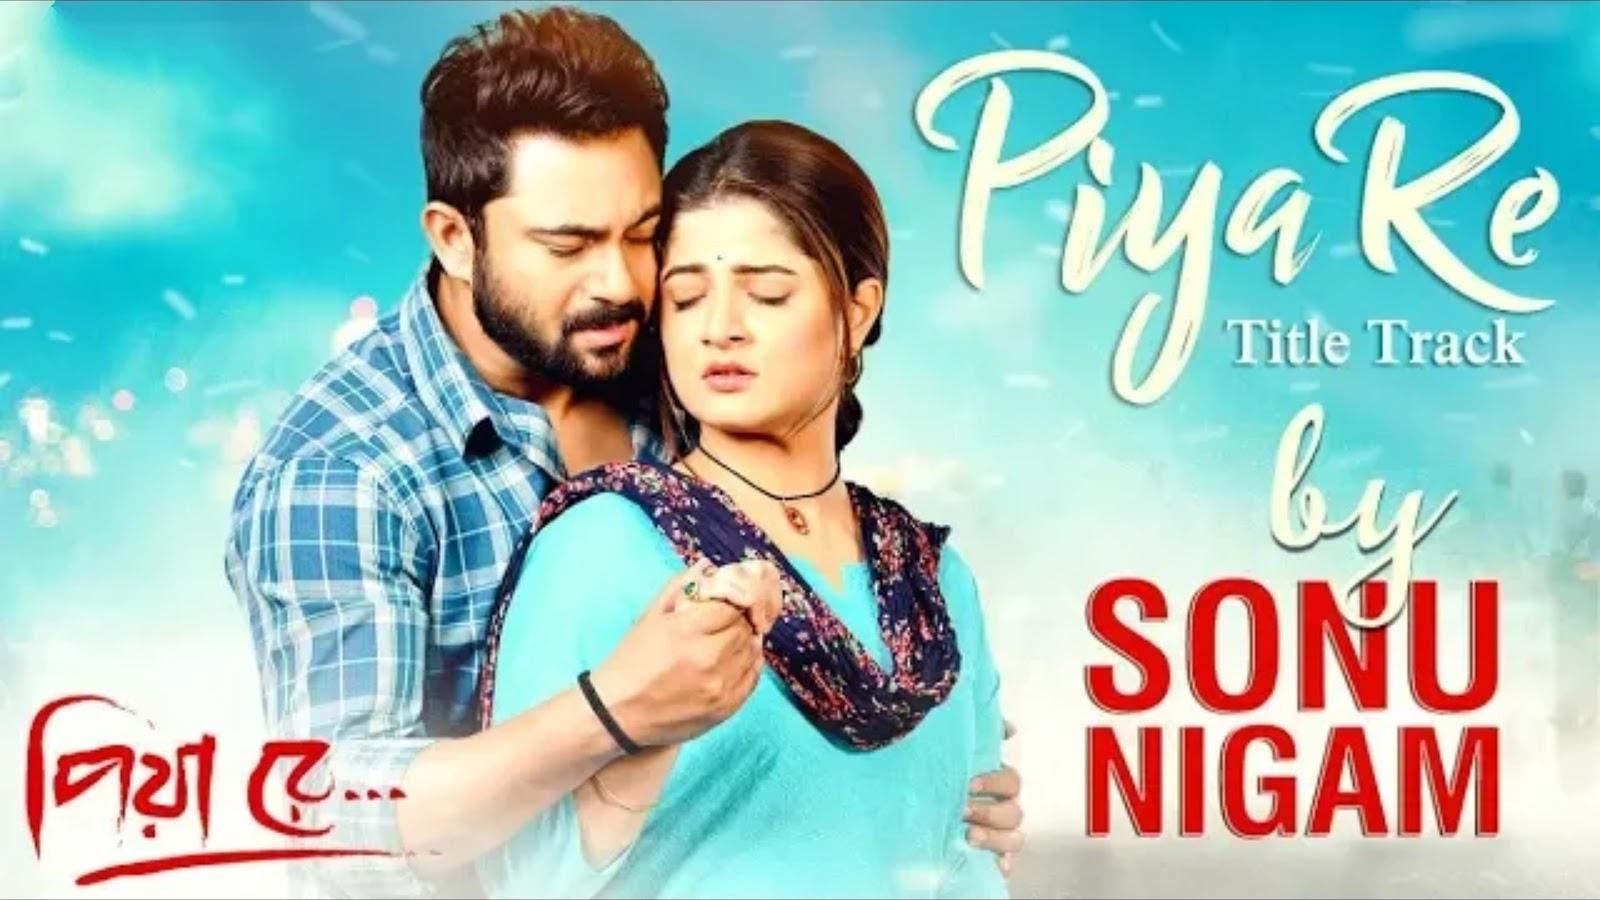 Piya Re Title Track Sonu Nigam Jeet Ganguli Guitar Chords